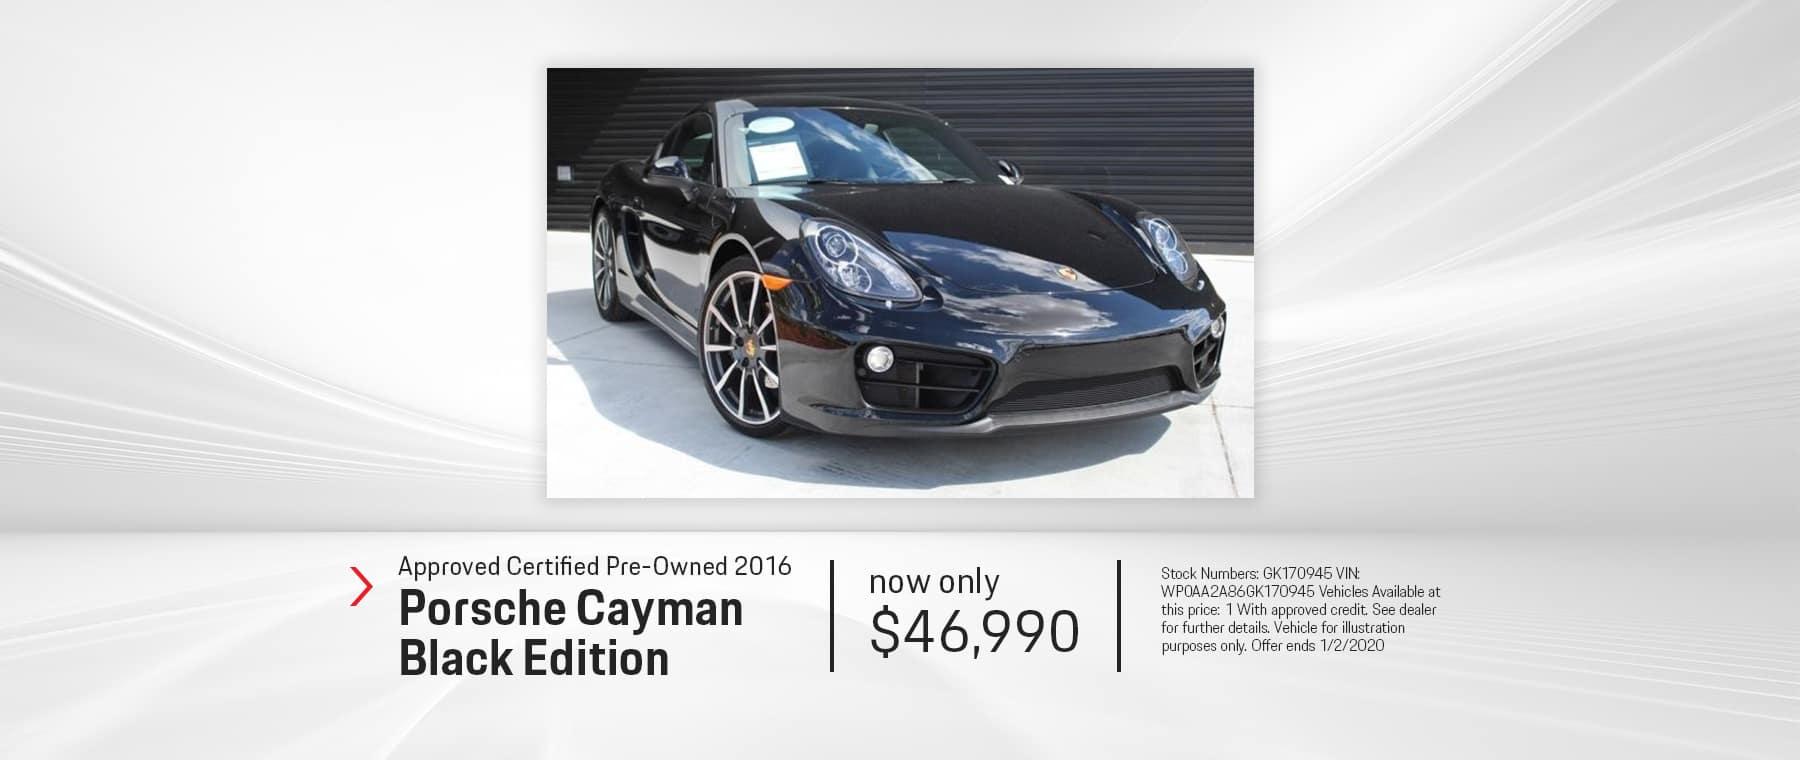 2016 CAYMAN BLACK EDITION CPO $46,990